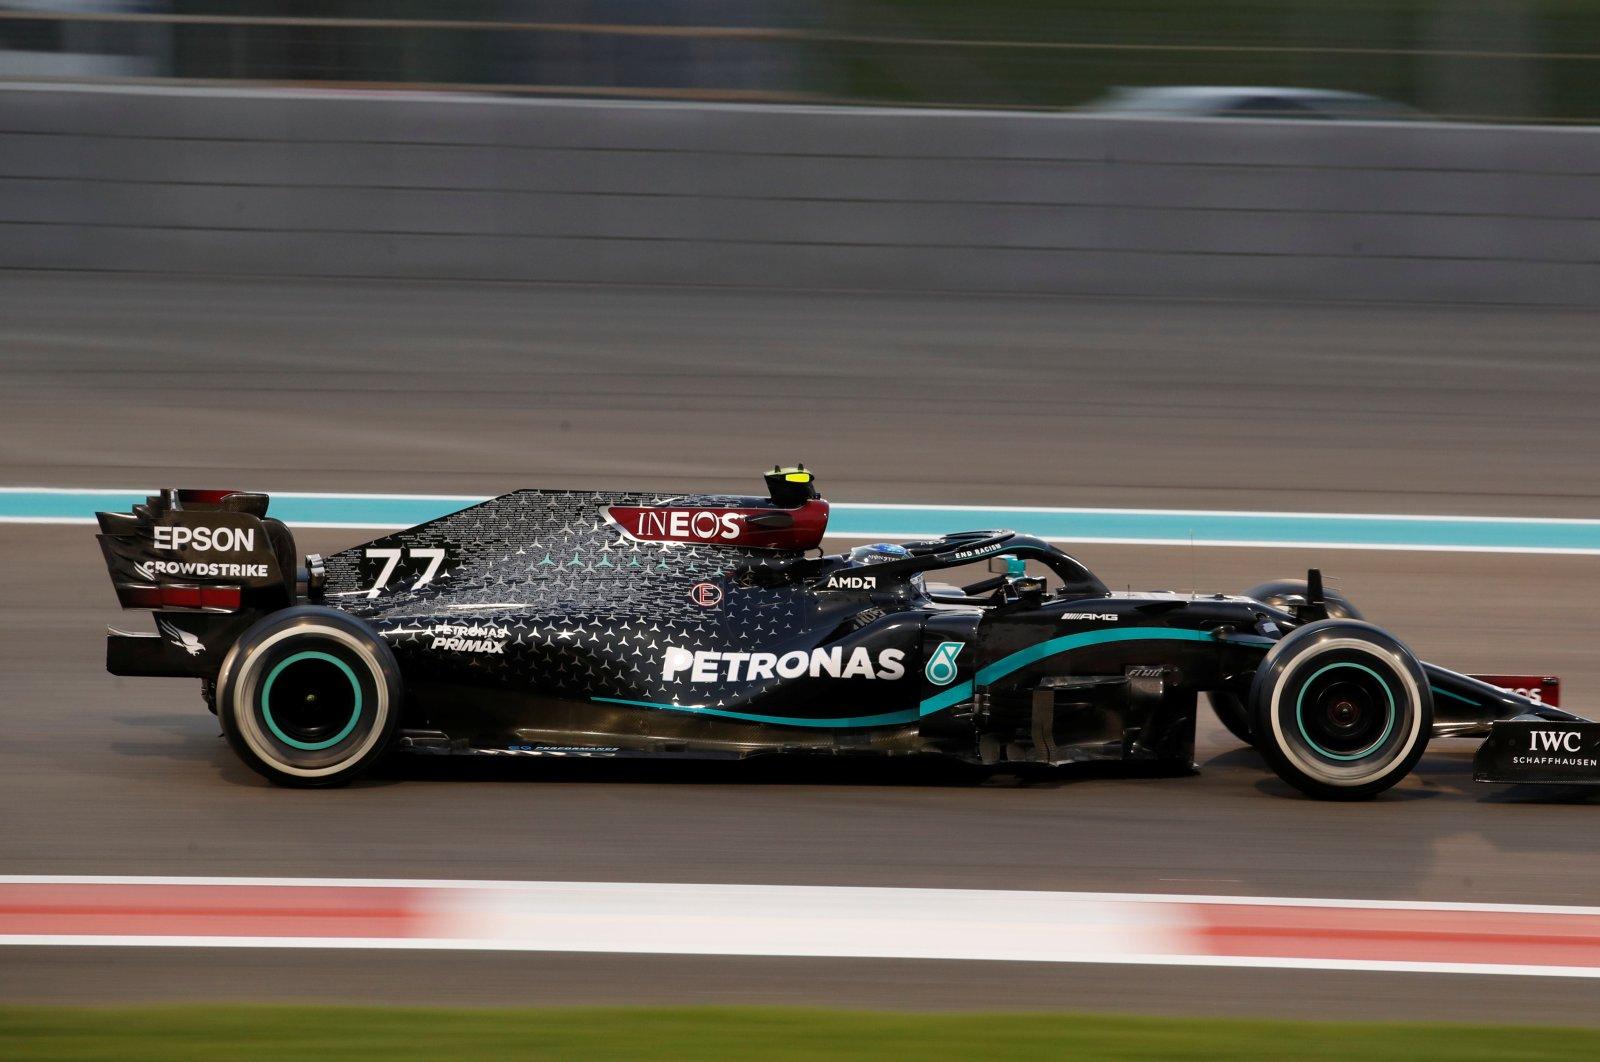 Mercedes' Valtteri Bottas in action during the Abu Dhabi Grand Prix, Yas Marina Circuit, Abu Dhabi, Dec. 13, 2020. (Reuters Photo)